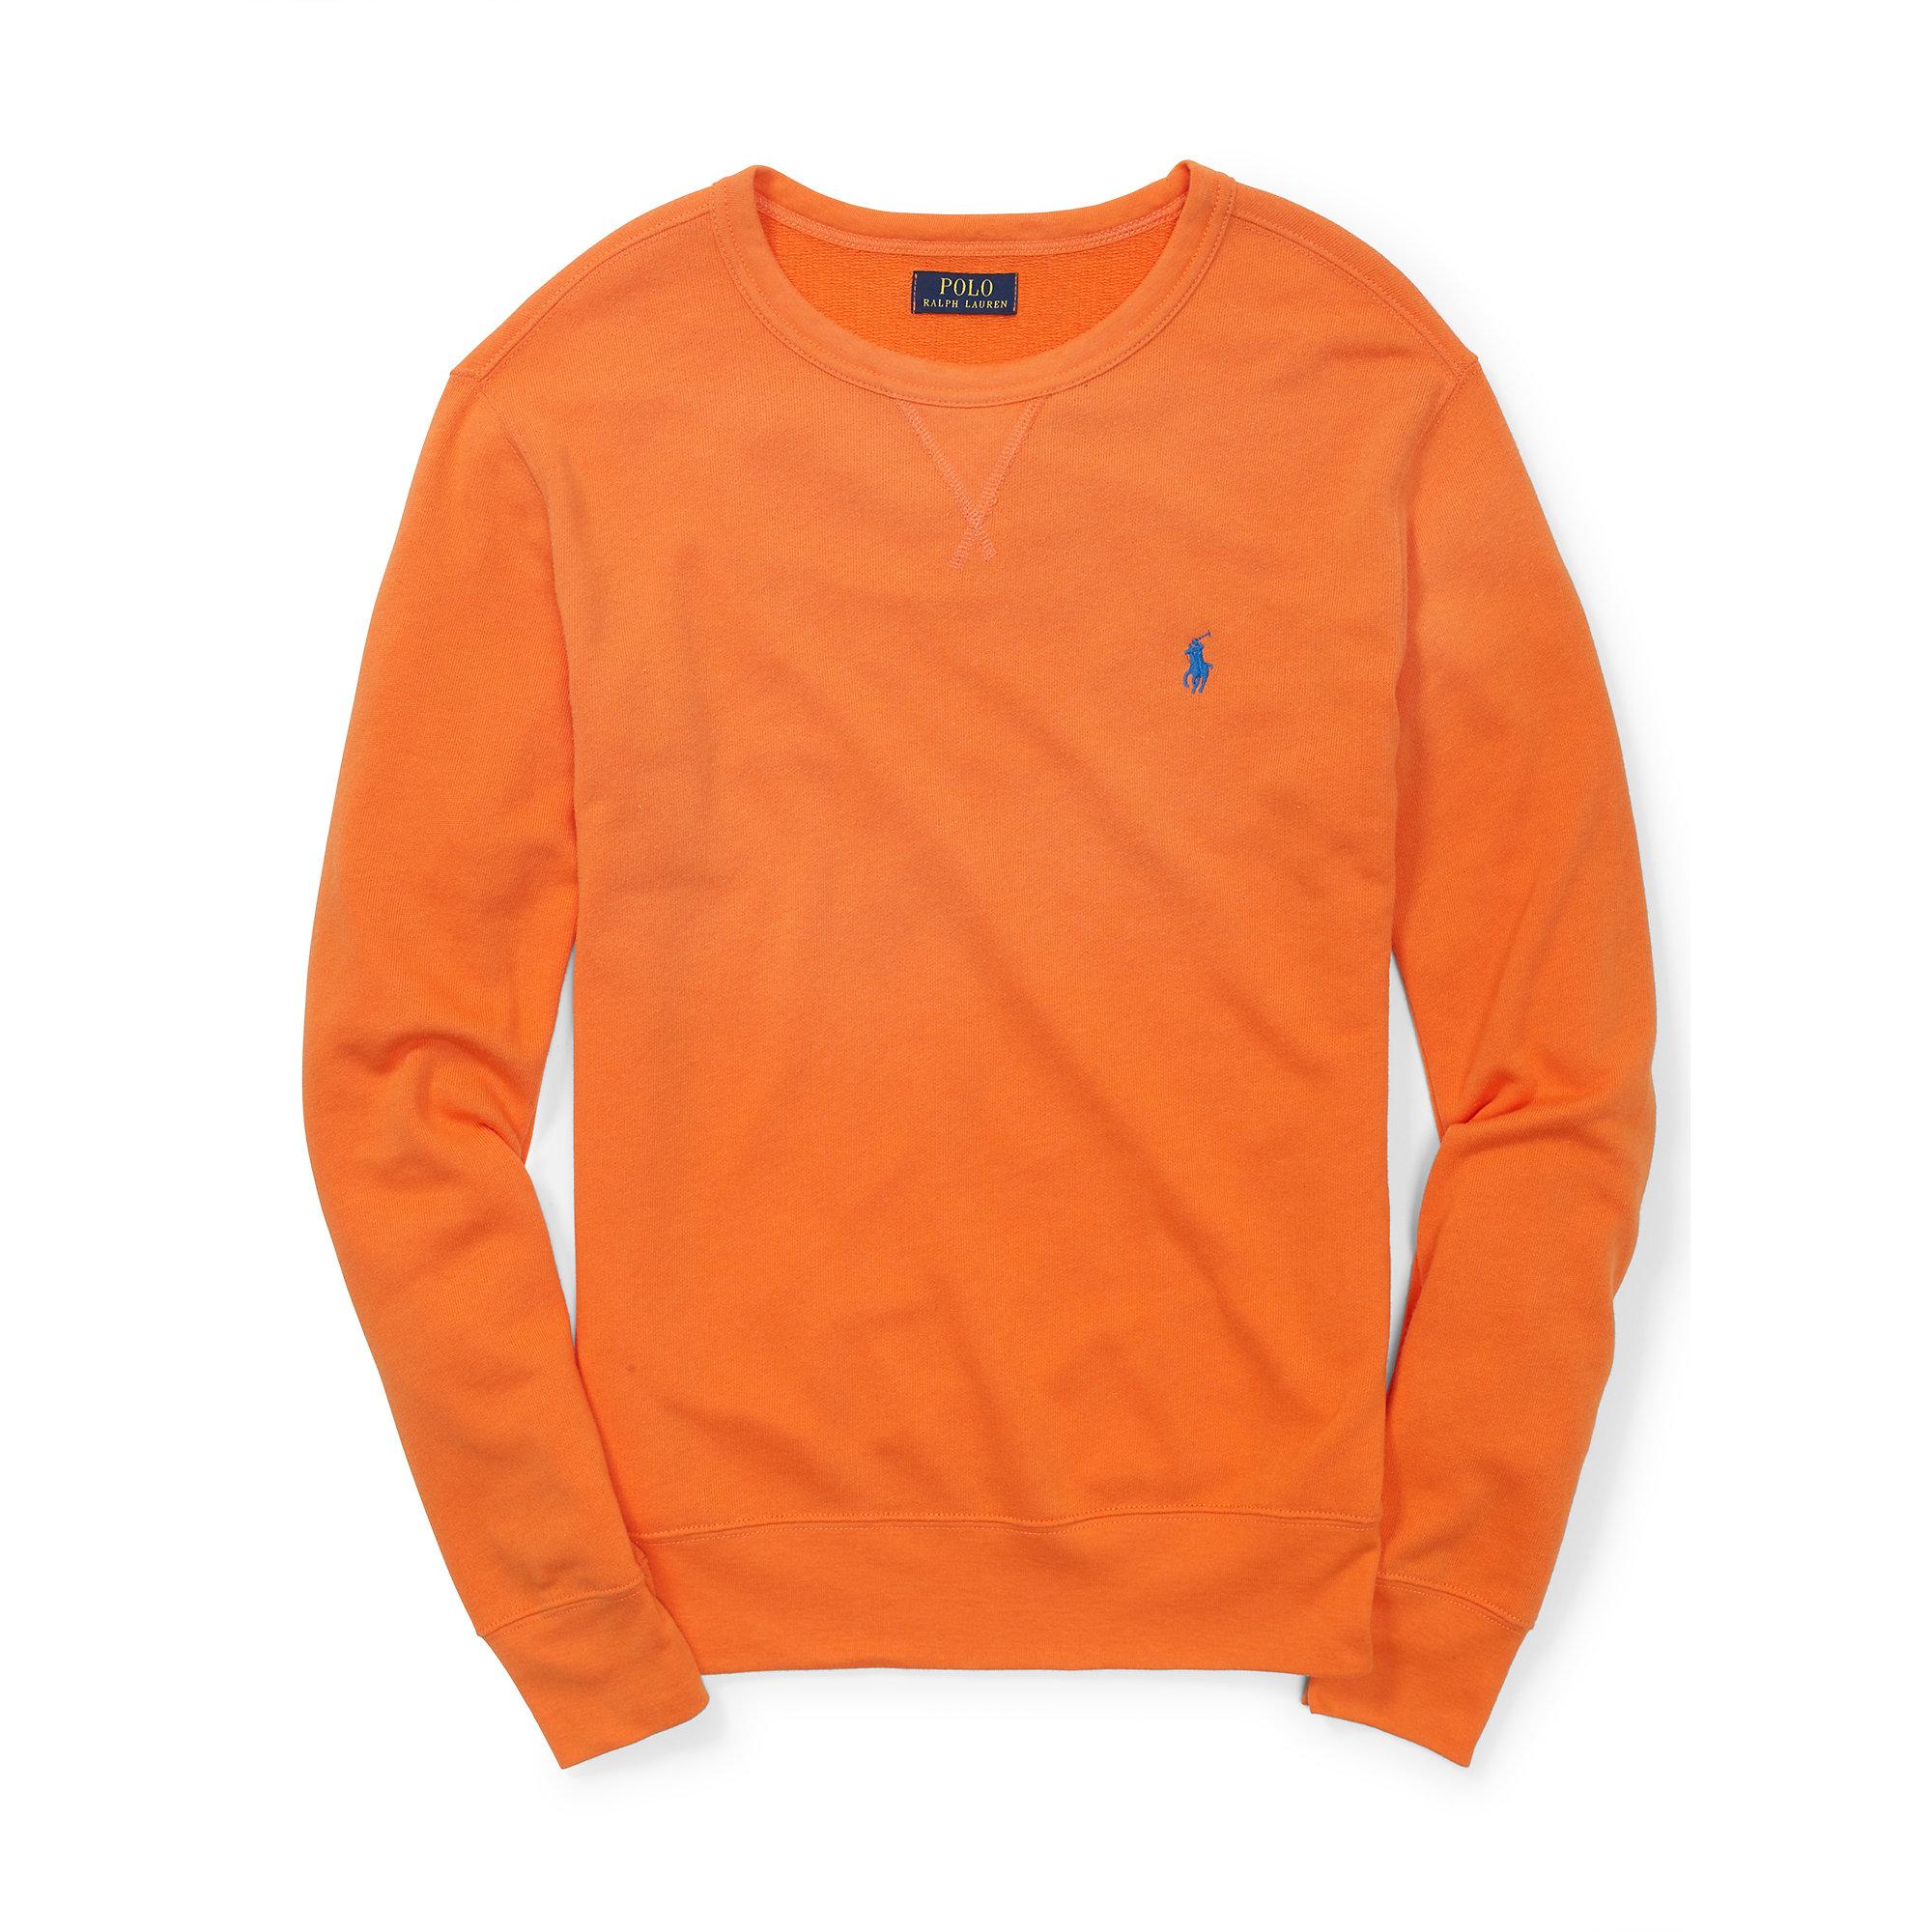 3944fb4bf ... new zealand lyst polo ralph lauren french terry sweatshirt in orange  for men 34642 2f3b8